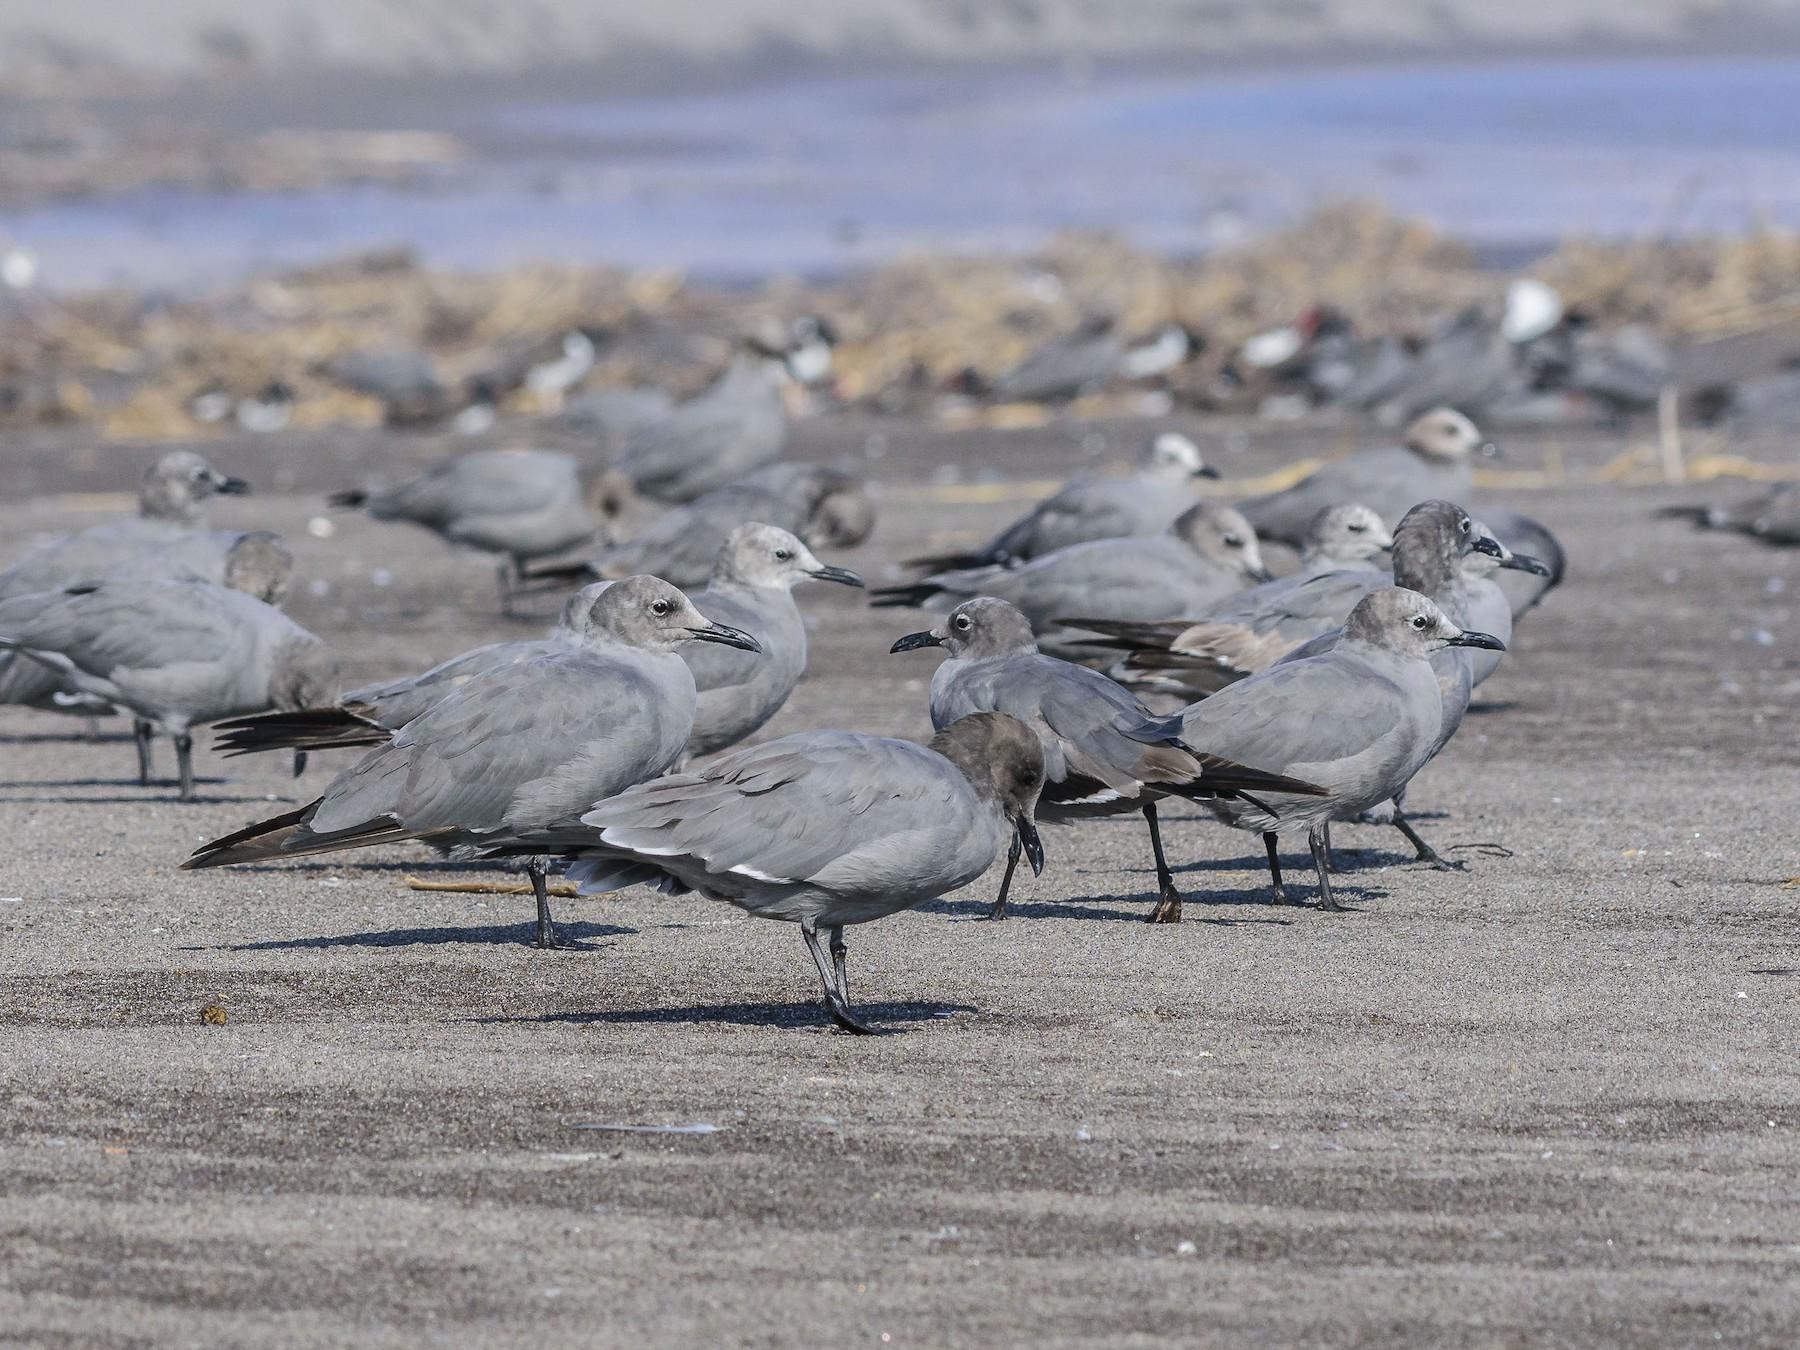 Gray Gull - VERONICA ARAYA GARCIA